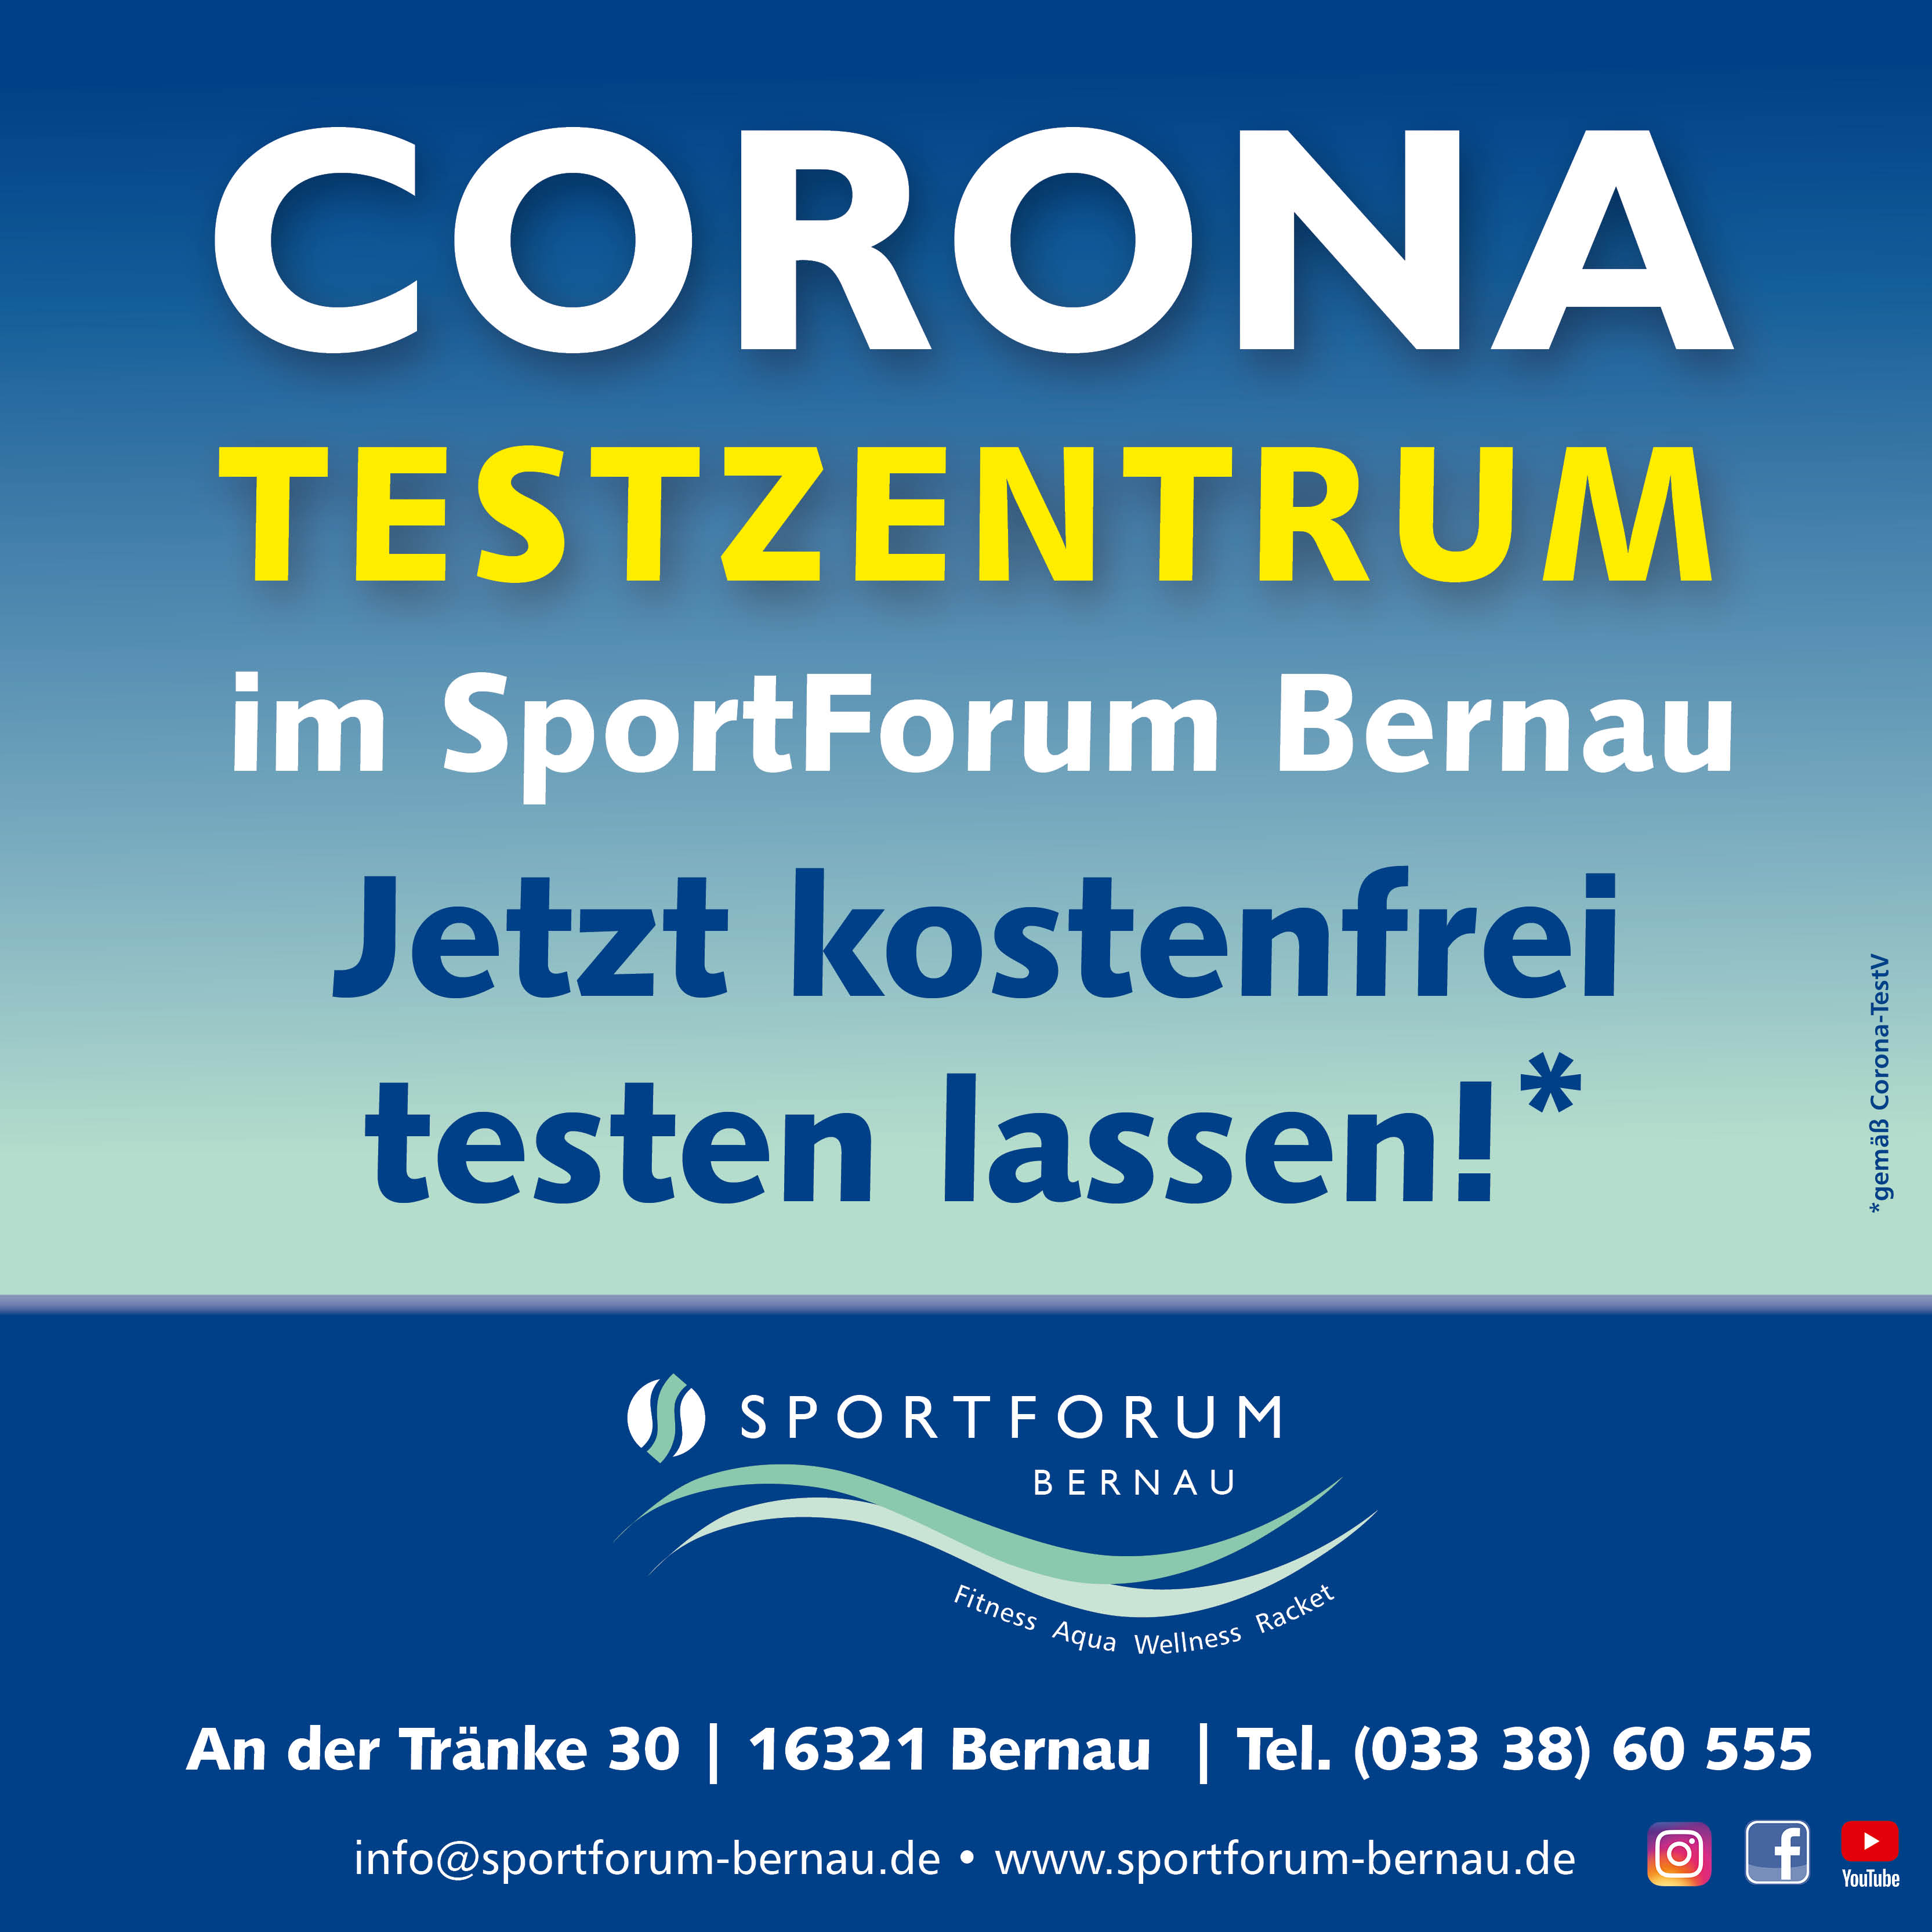 Corona Testzentrum im SportForum Bernau